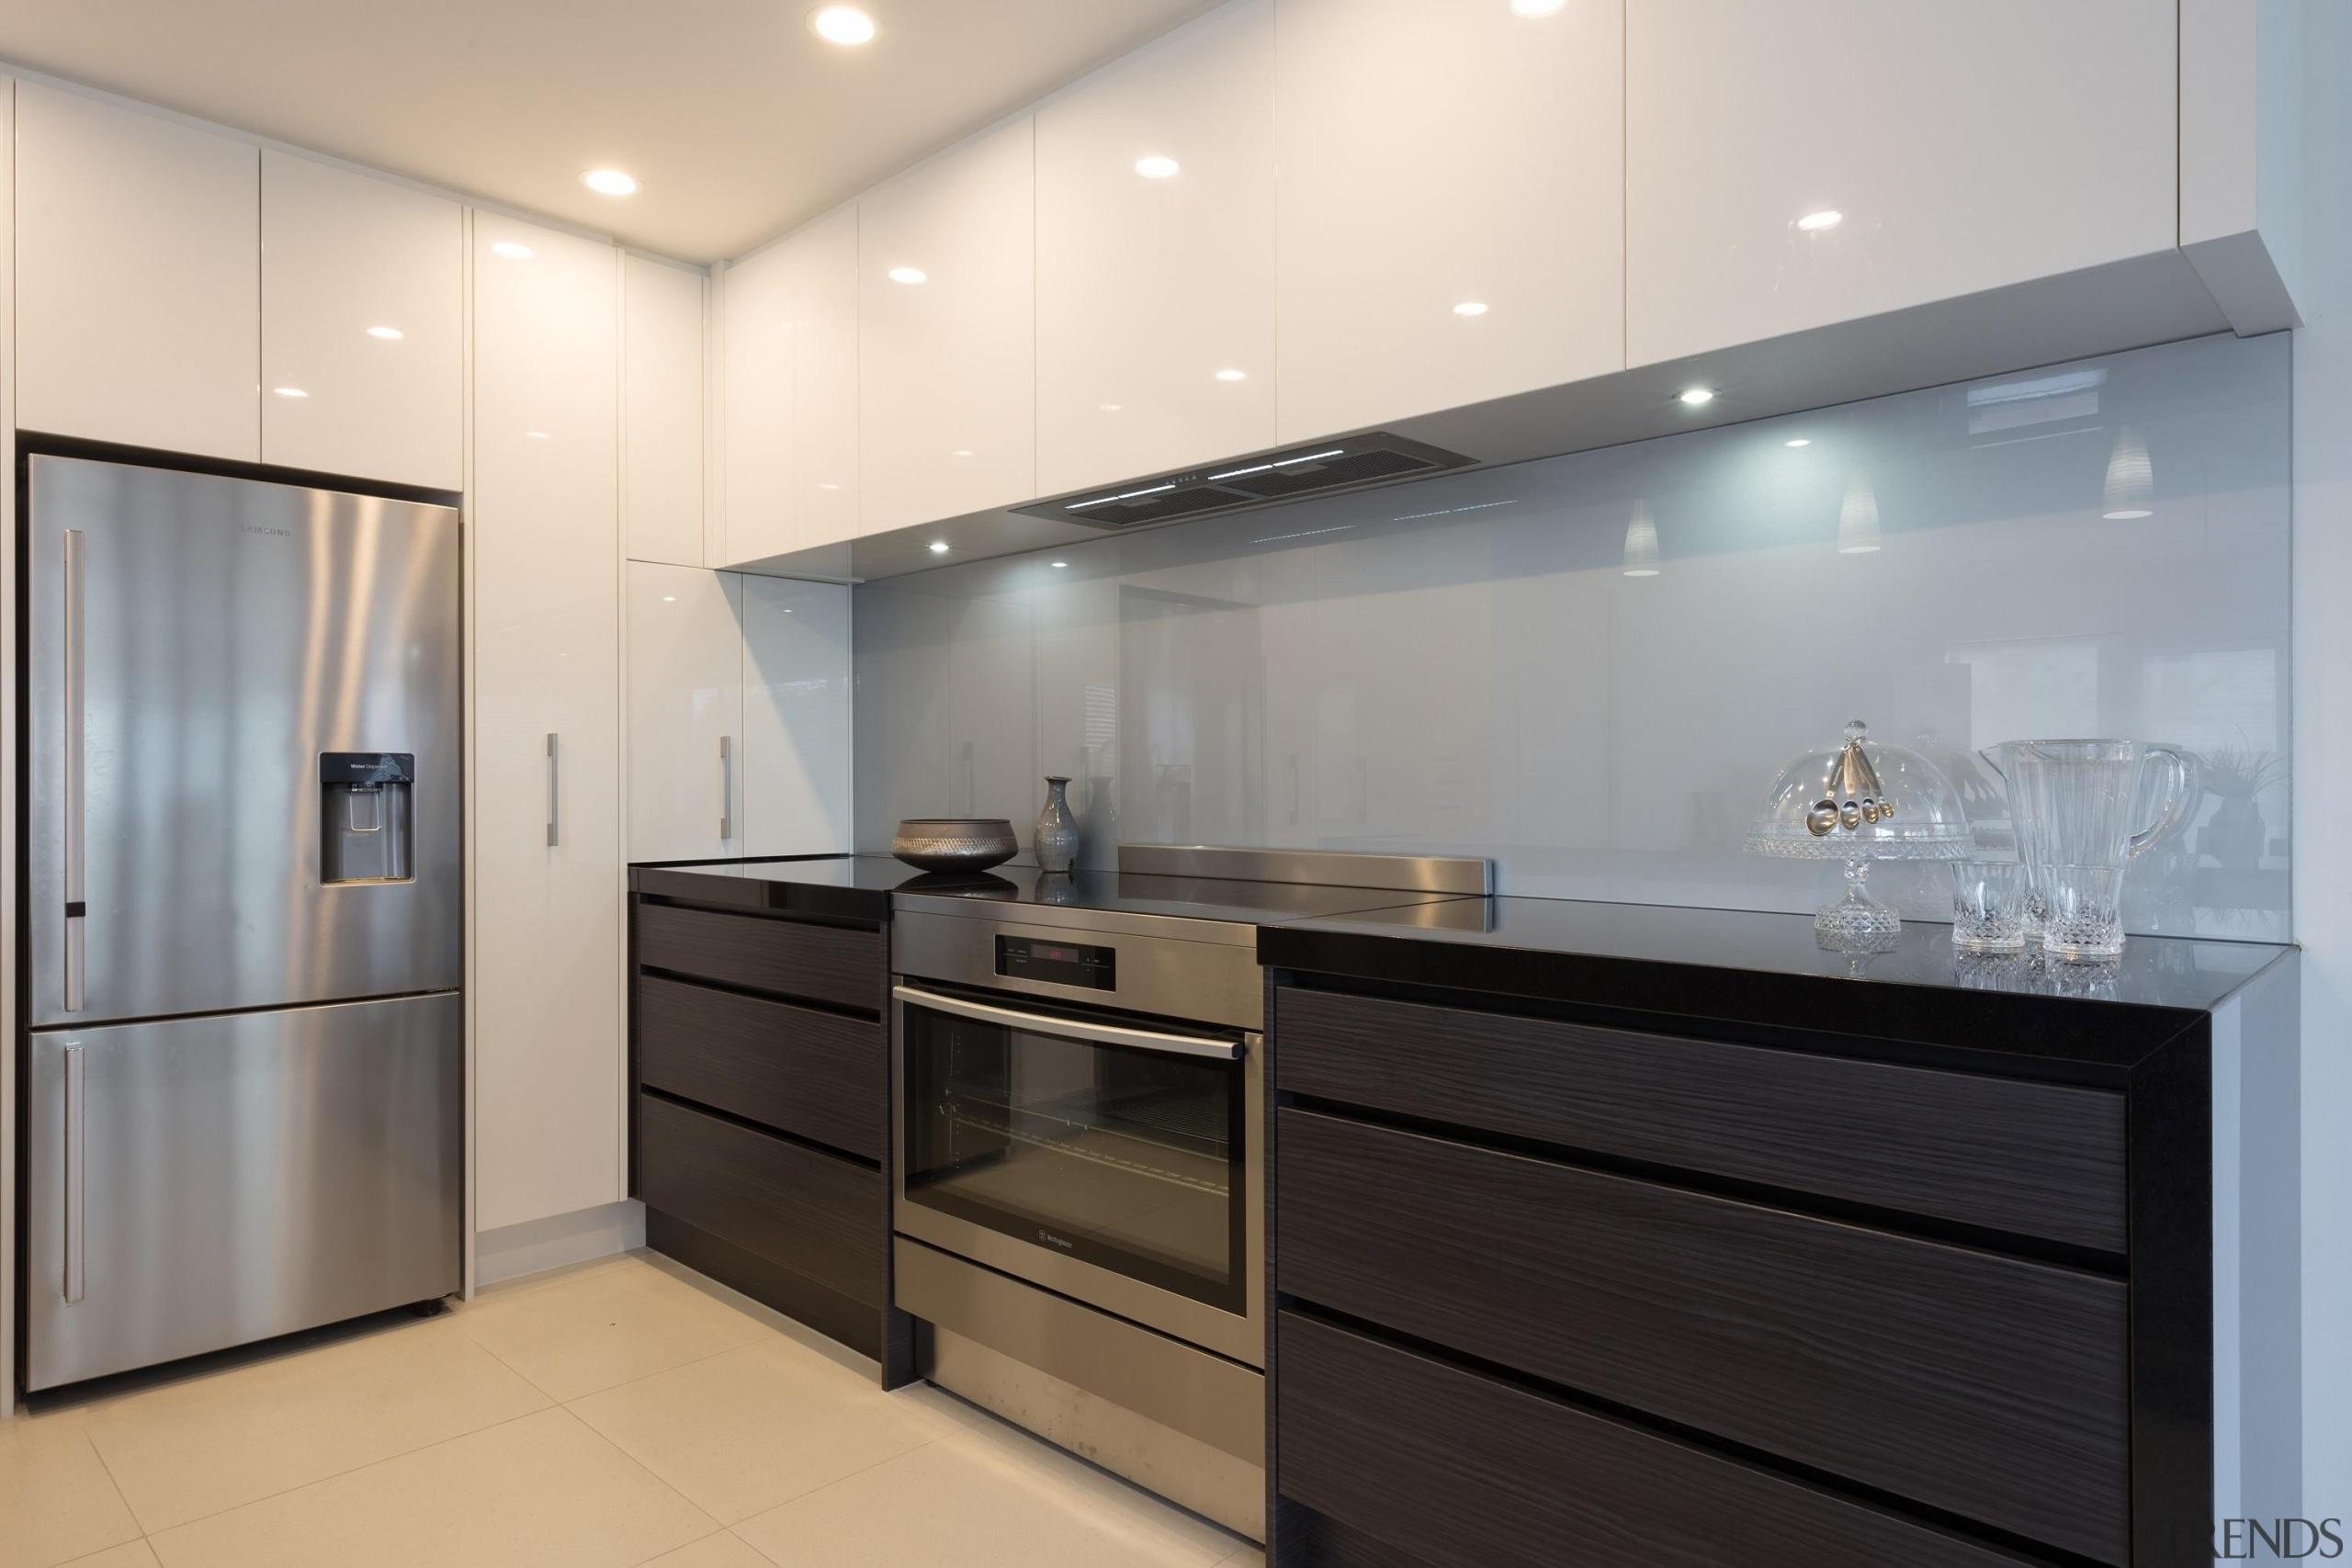 designatek gloss, designatek textured, profile handle, bar fridge, cabinetry, countertop, interior design, kitchen, product design, room, gray, white